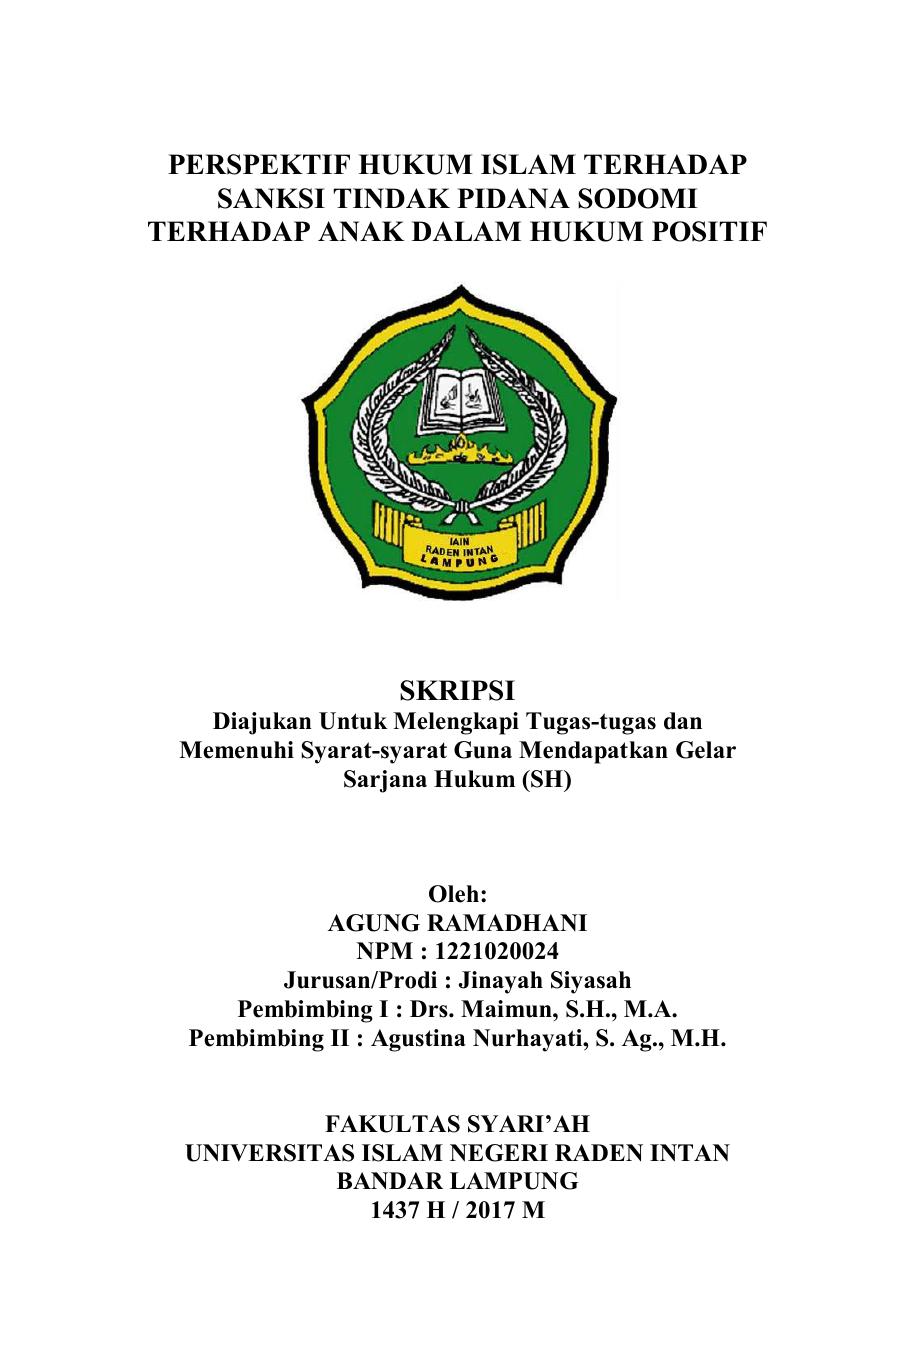 Contoh Skripsi Hukum Pidana Islam Pejuang Skripsi